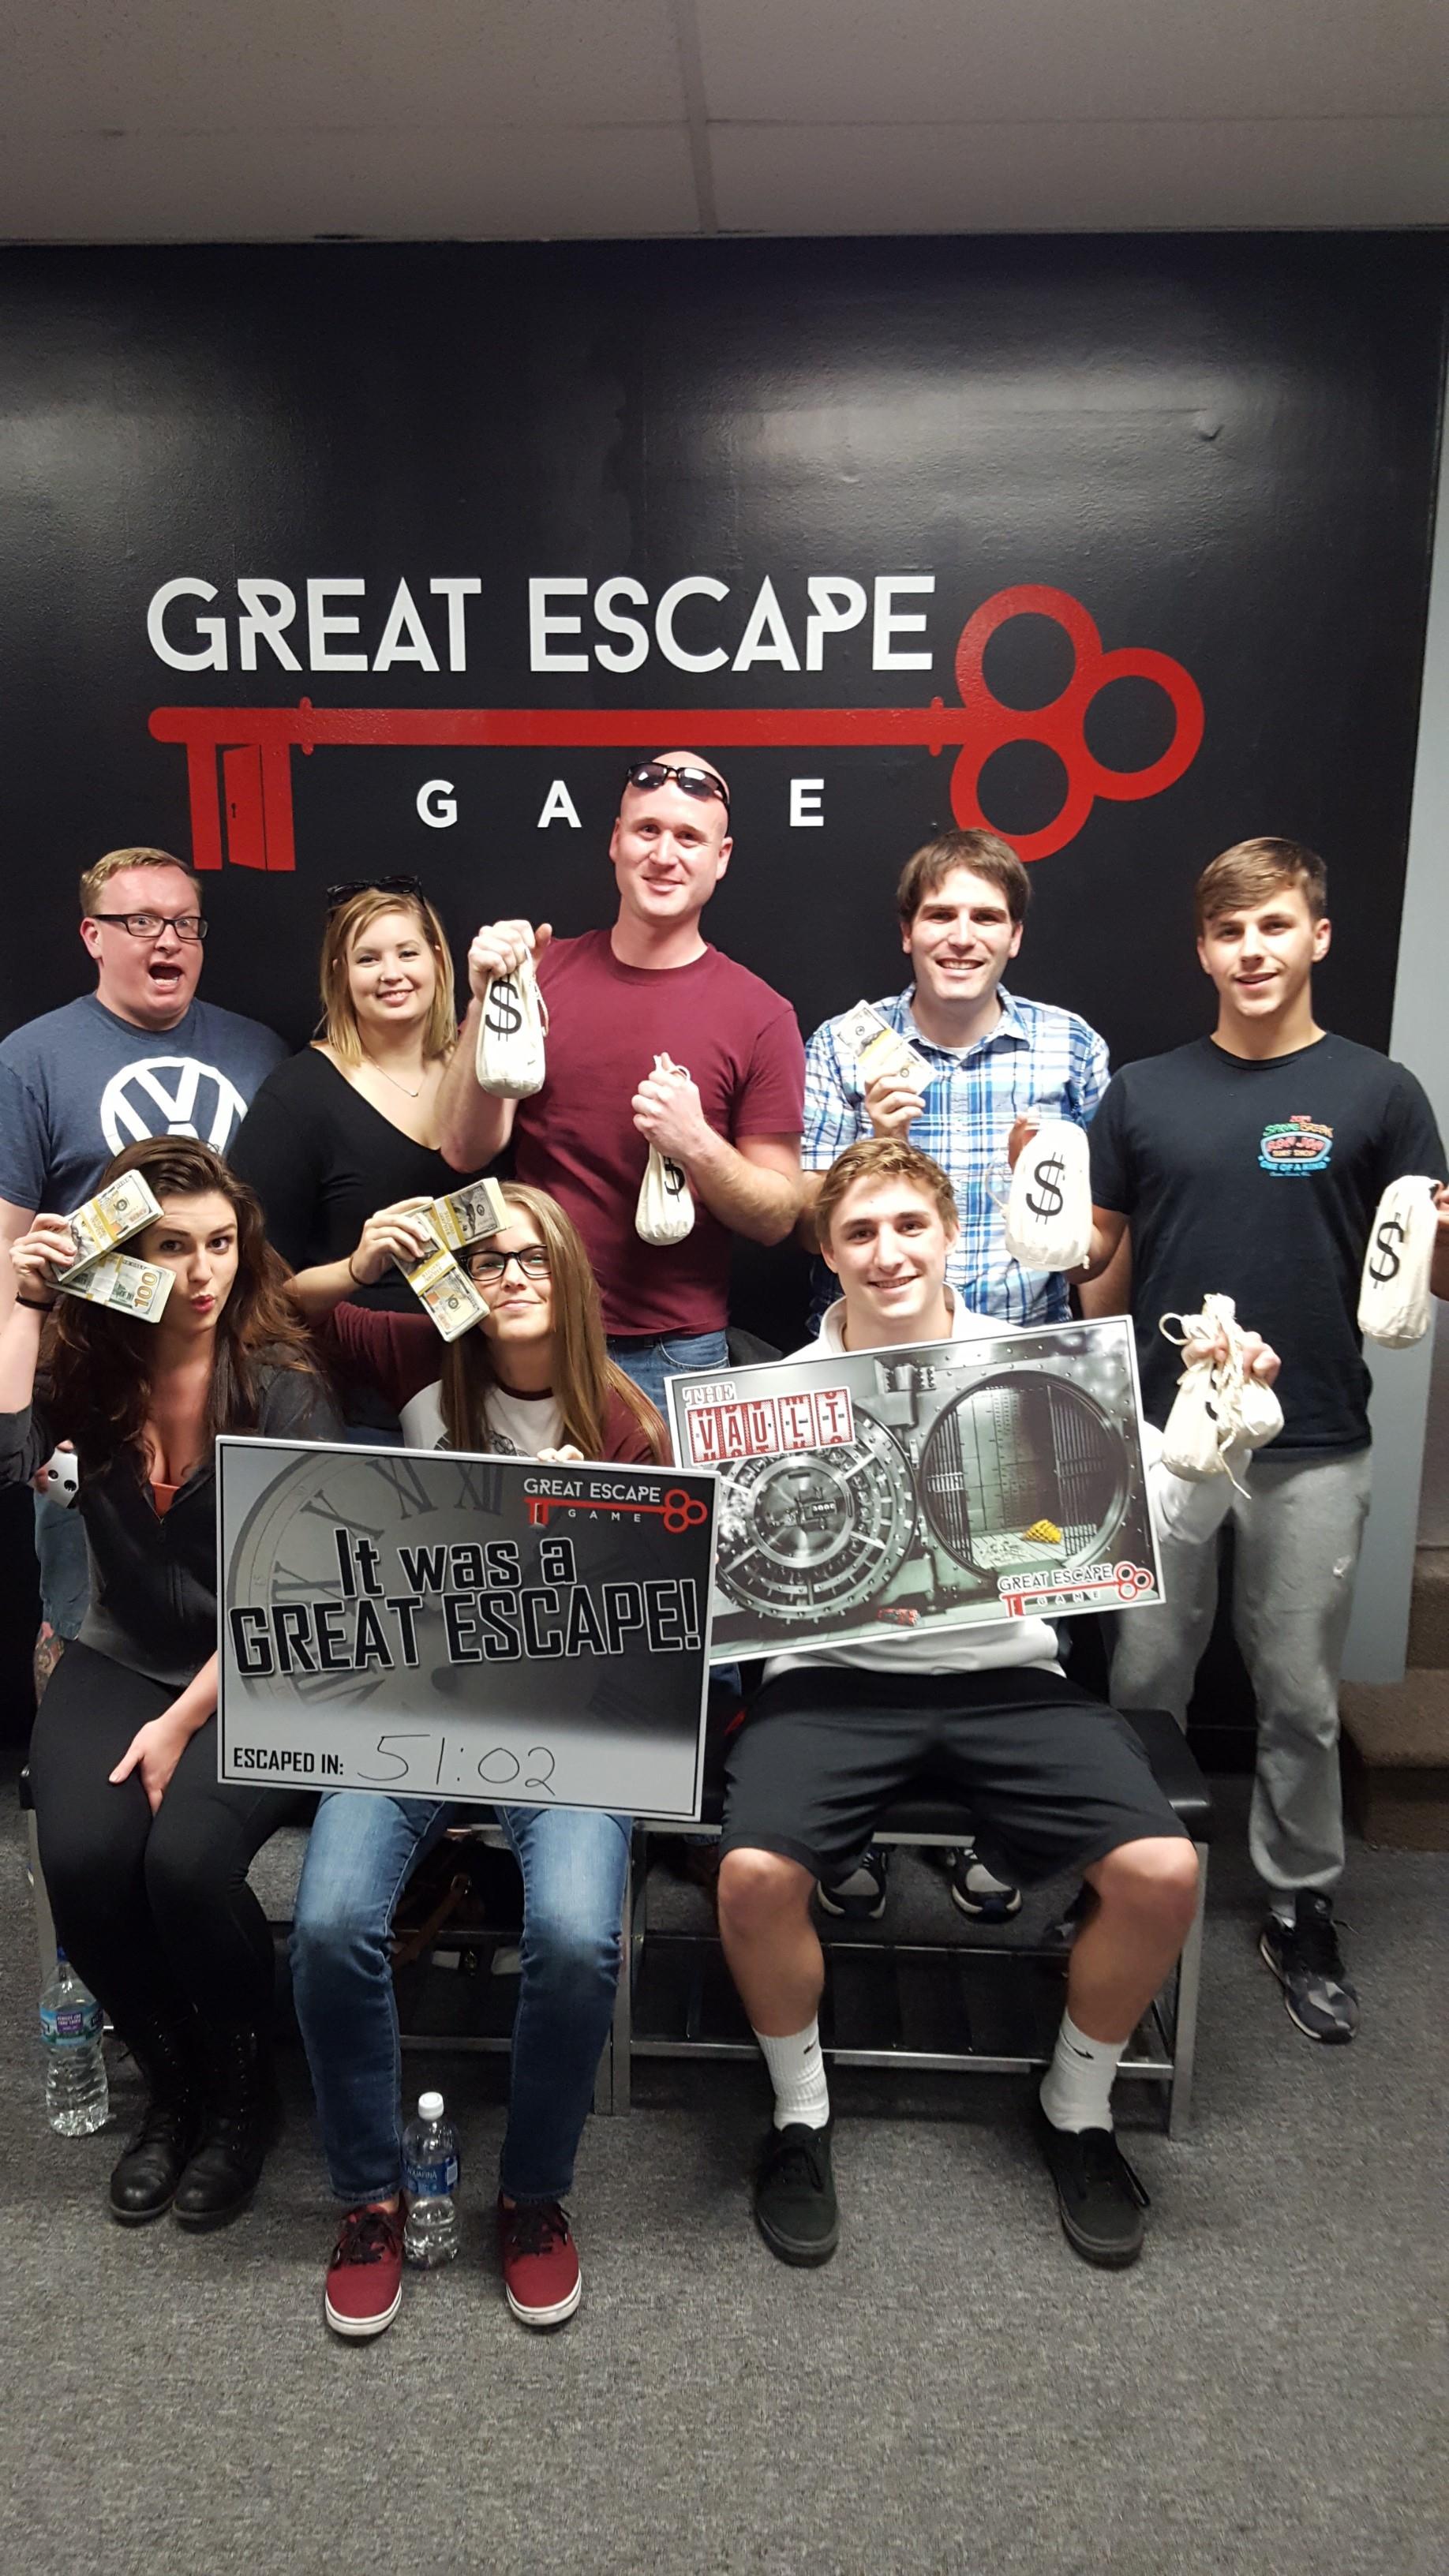 Great Escape Game Dayton Coupons Near Me In Beavercreek